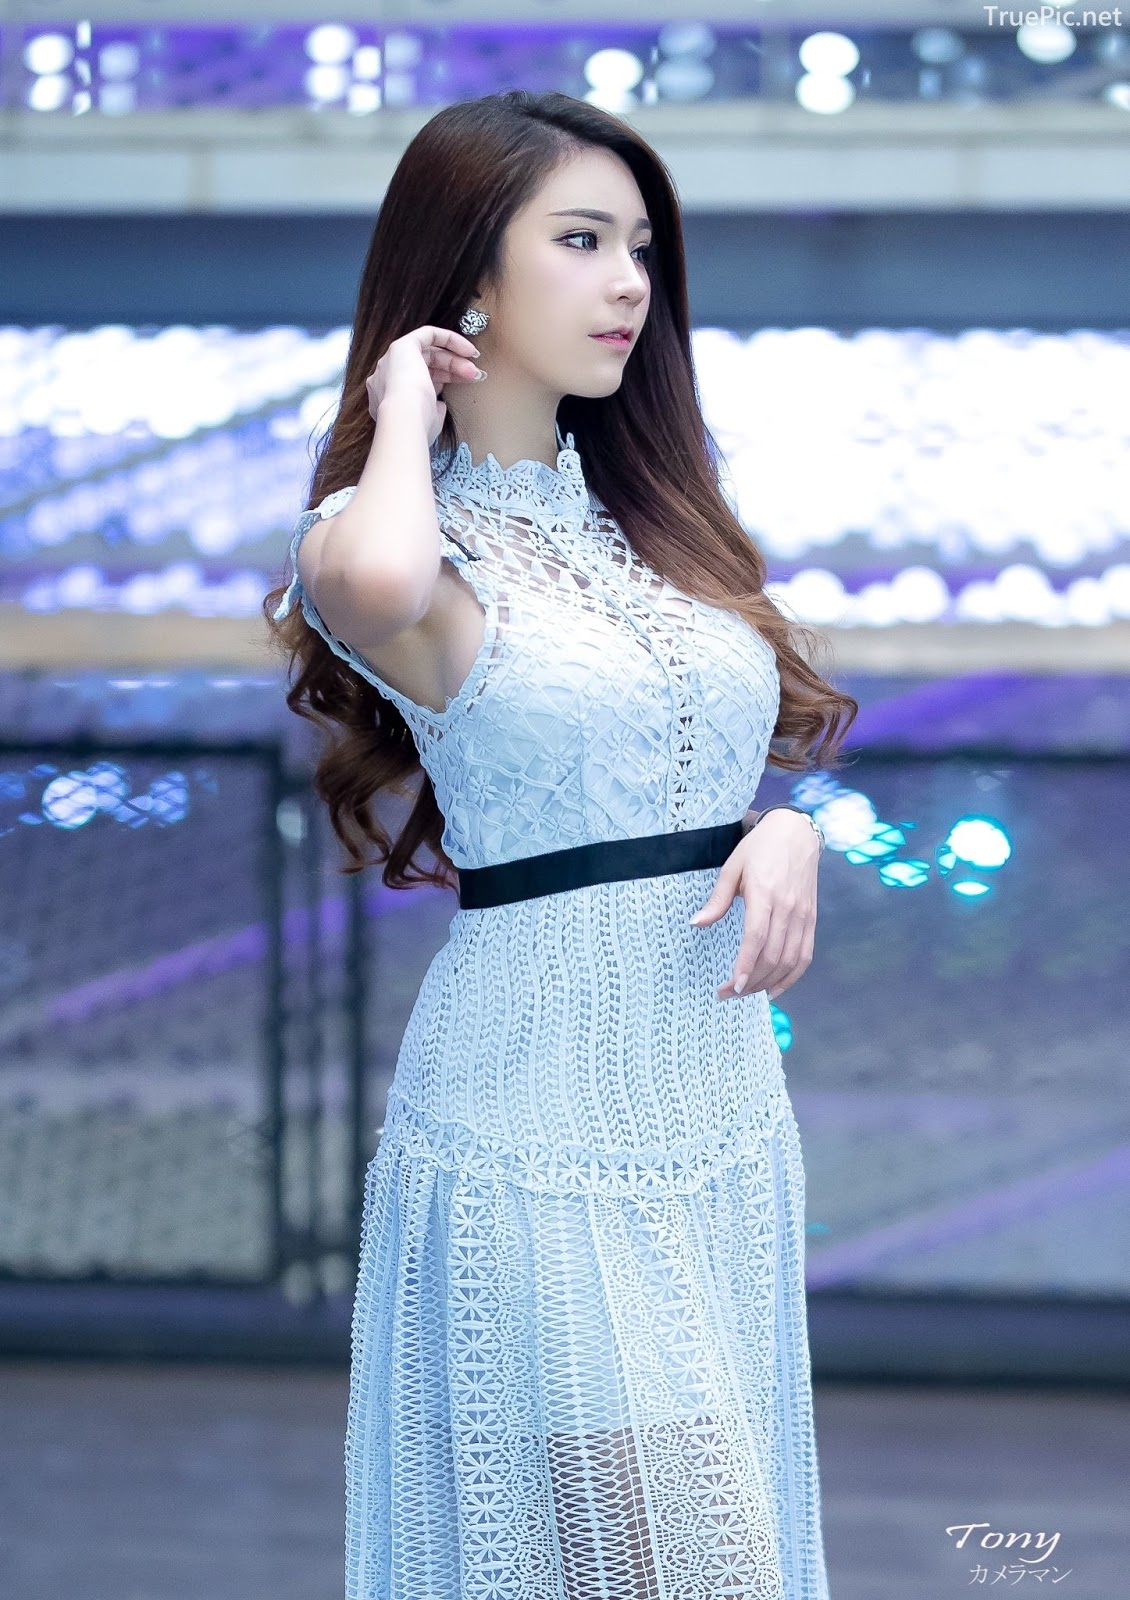 Thailand hot model – Janet Kanokwan Saesim – Sexy vs Cute and Bra vs Long Dress - Picture 2